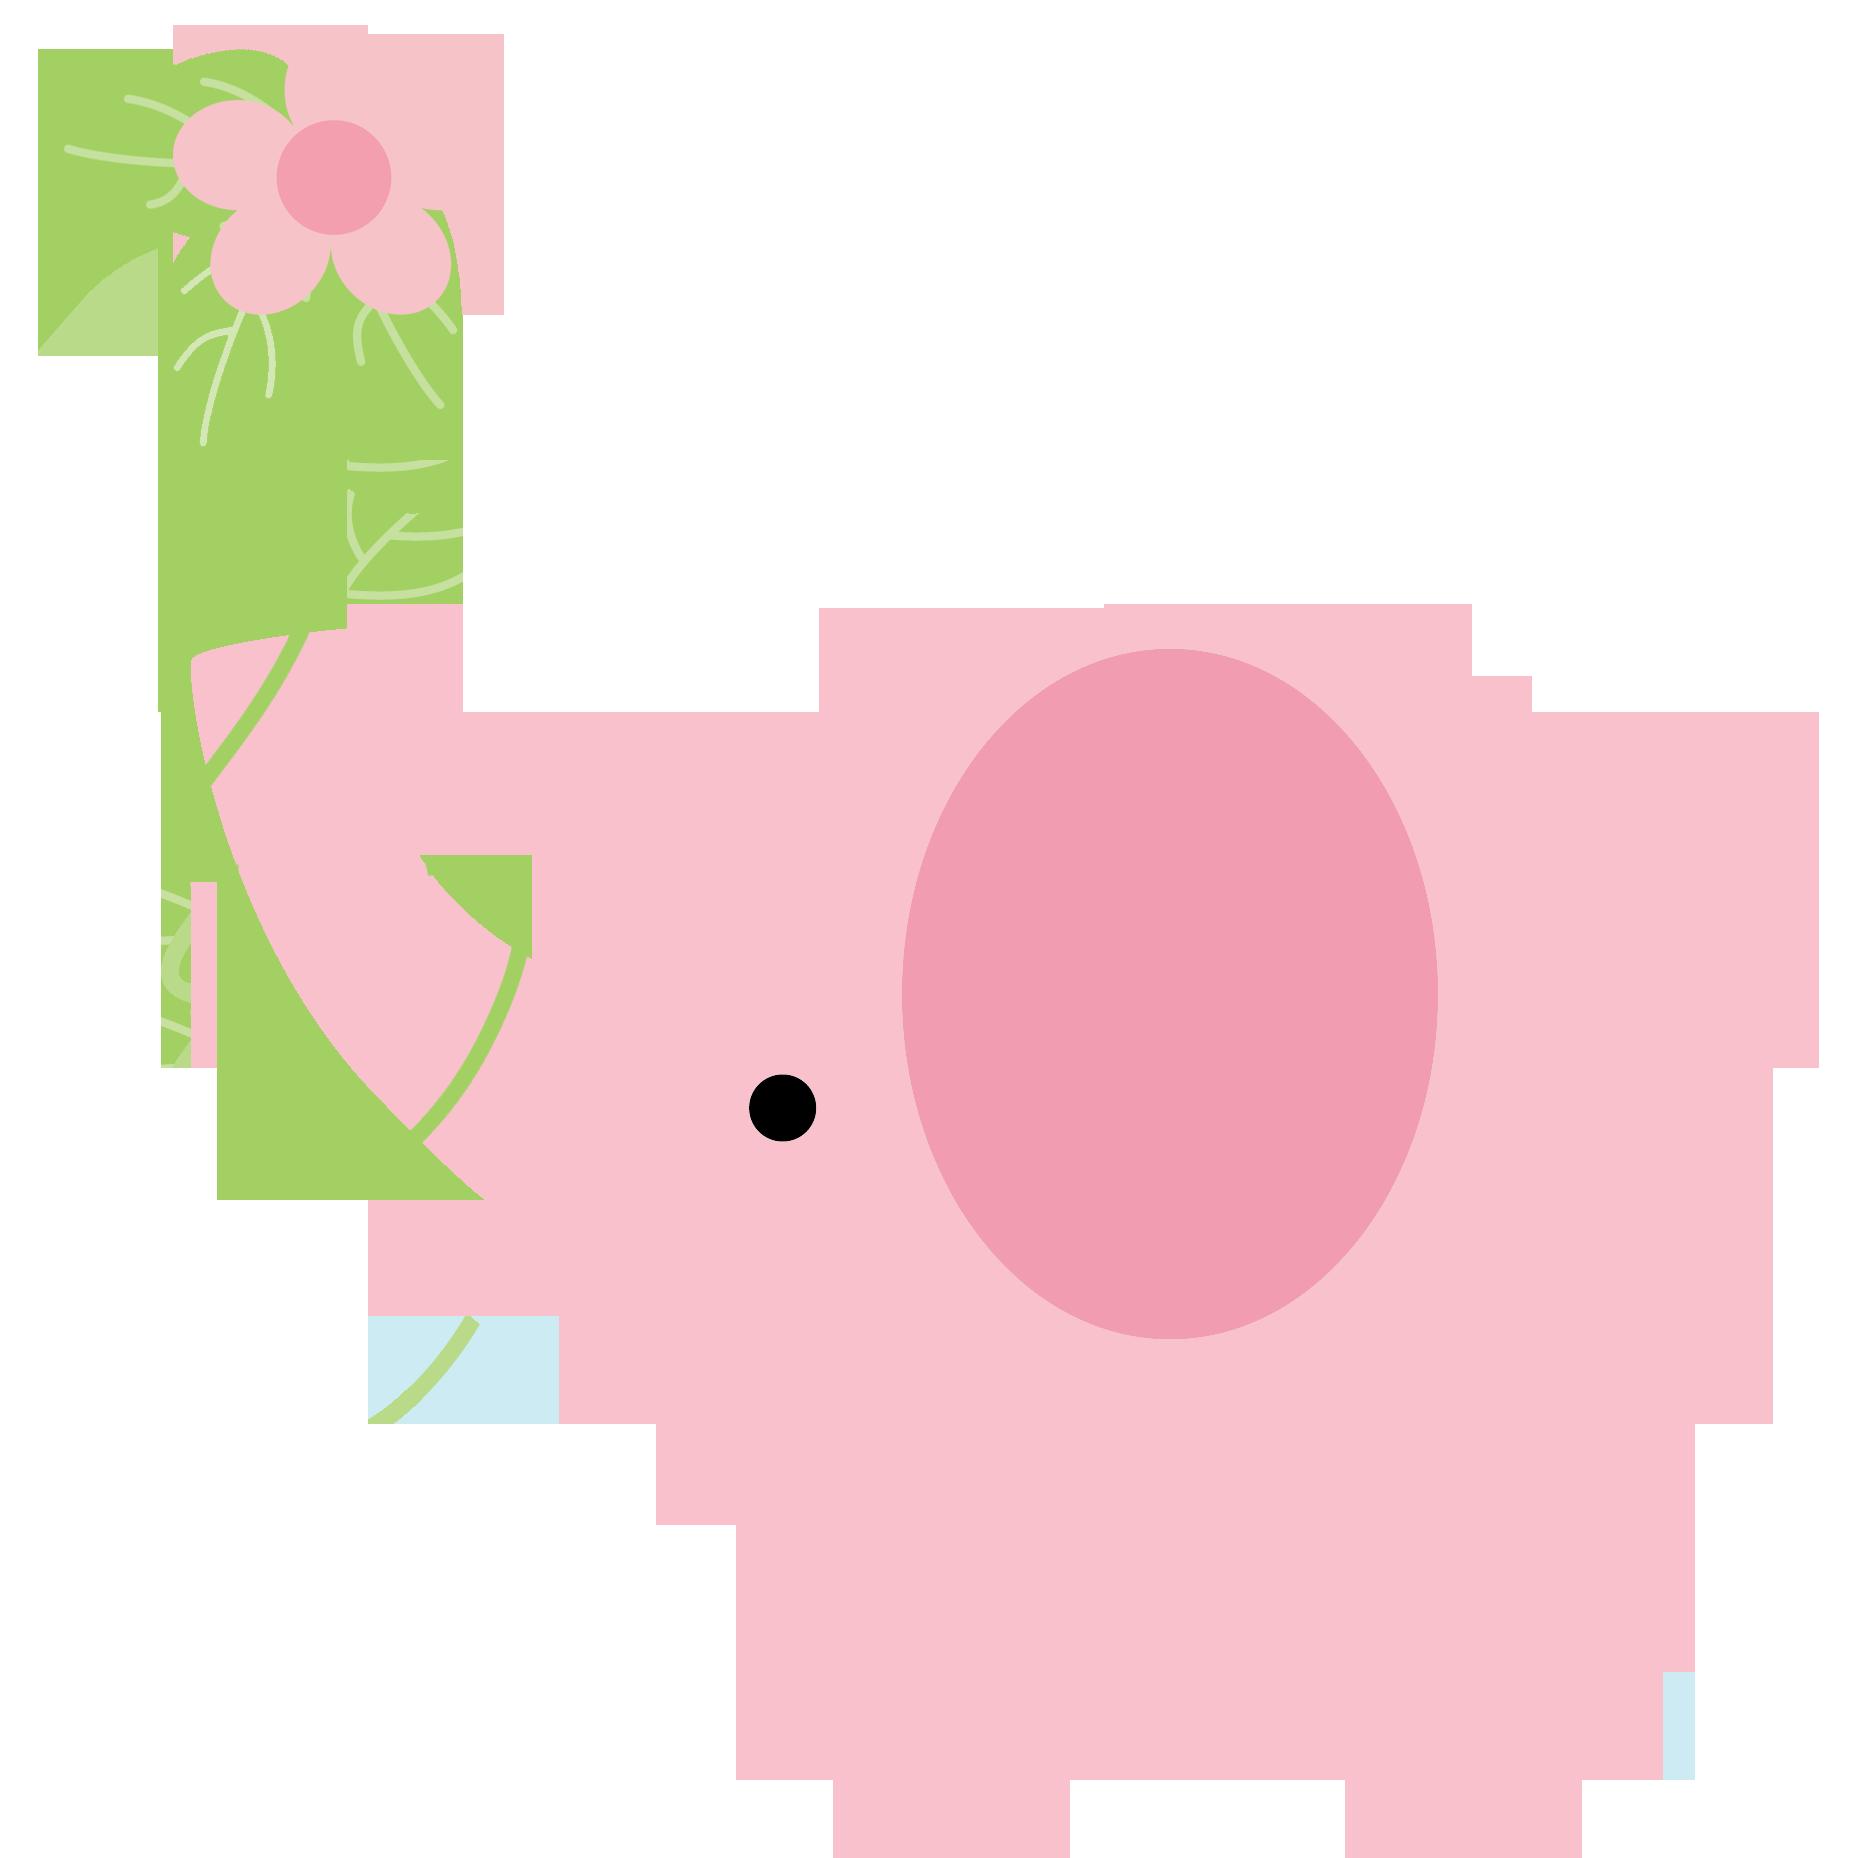 Elephant Clip Art Black And White | Clipart Panda - Free ... |Cartoon Baby Elephant Pink